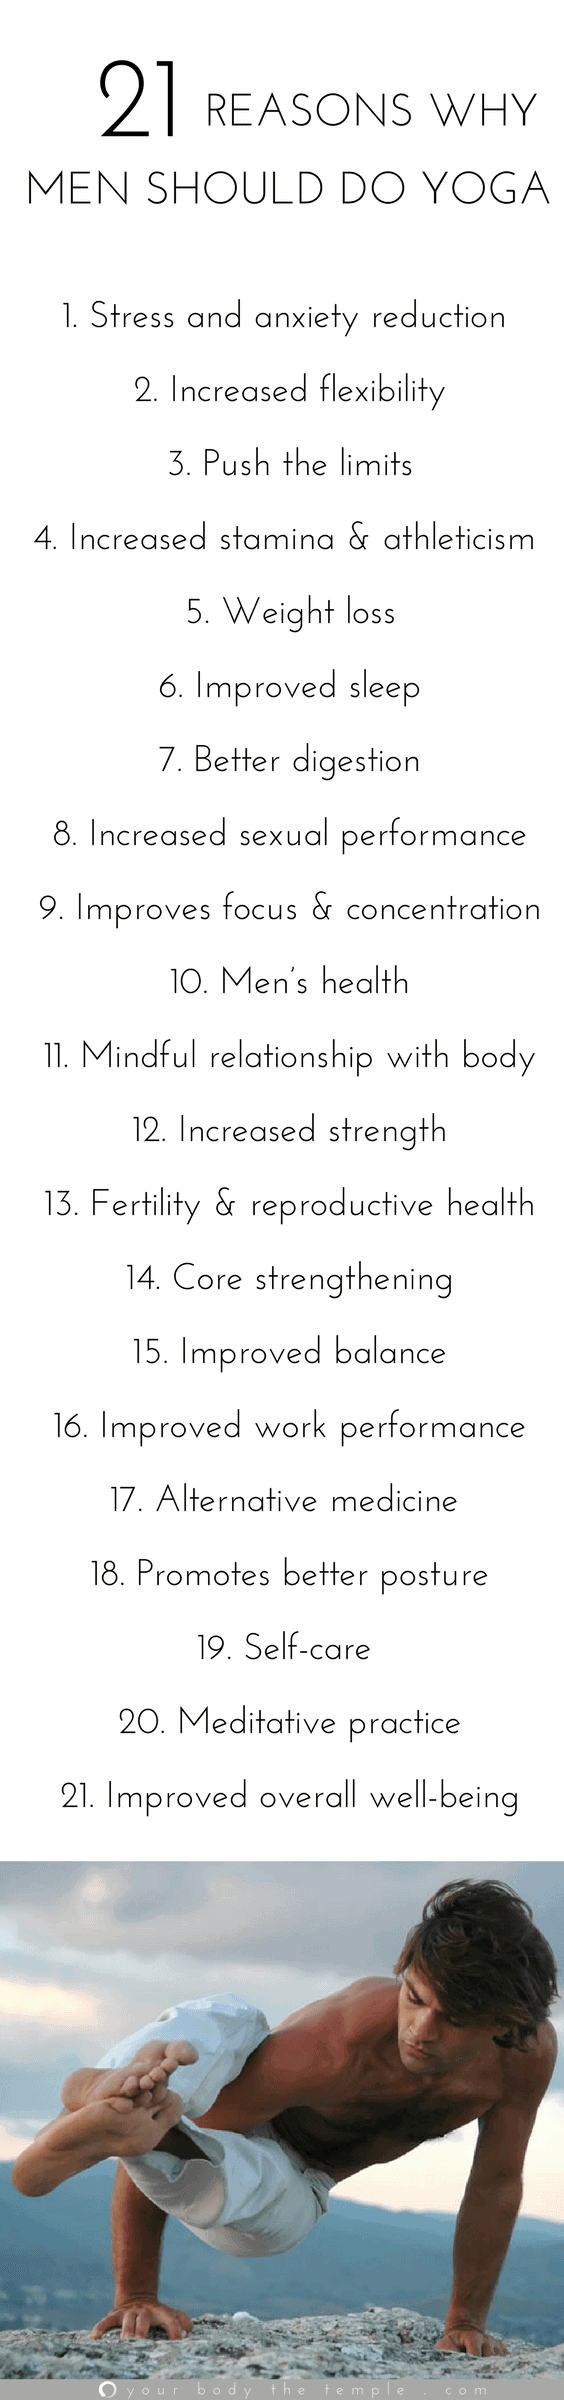 why men should do yoga